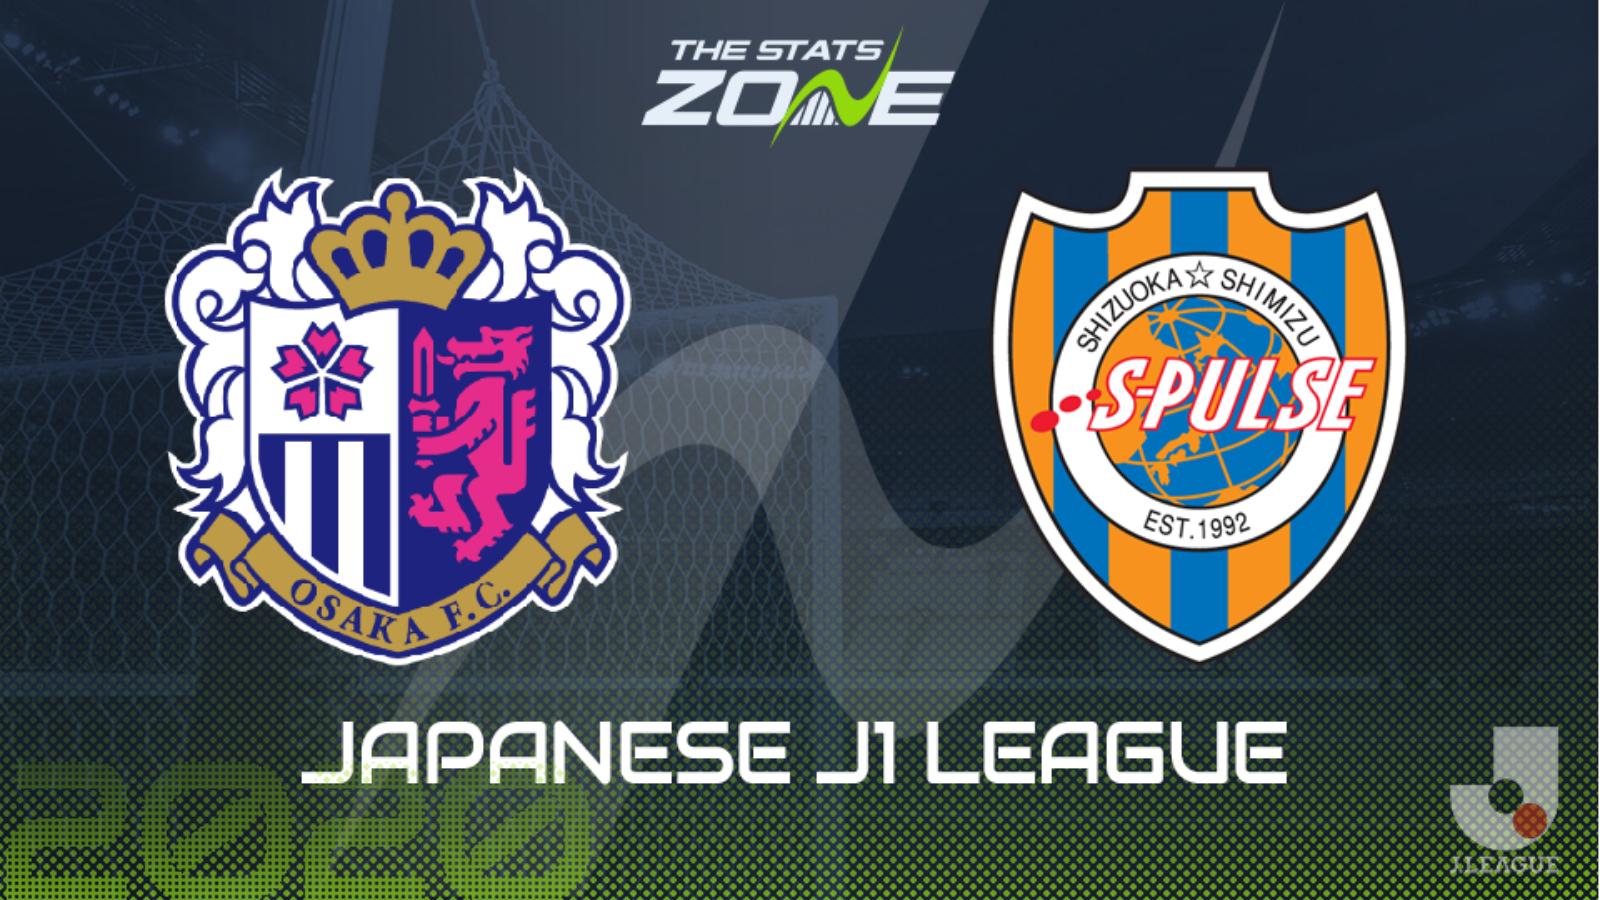 2019 20 Japanese J1 League Cerezo Osaka Vs Shimizu S Pulse Preview Prediction The Stats Zone